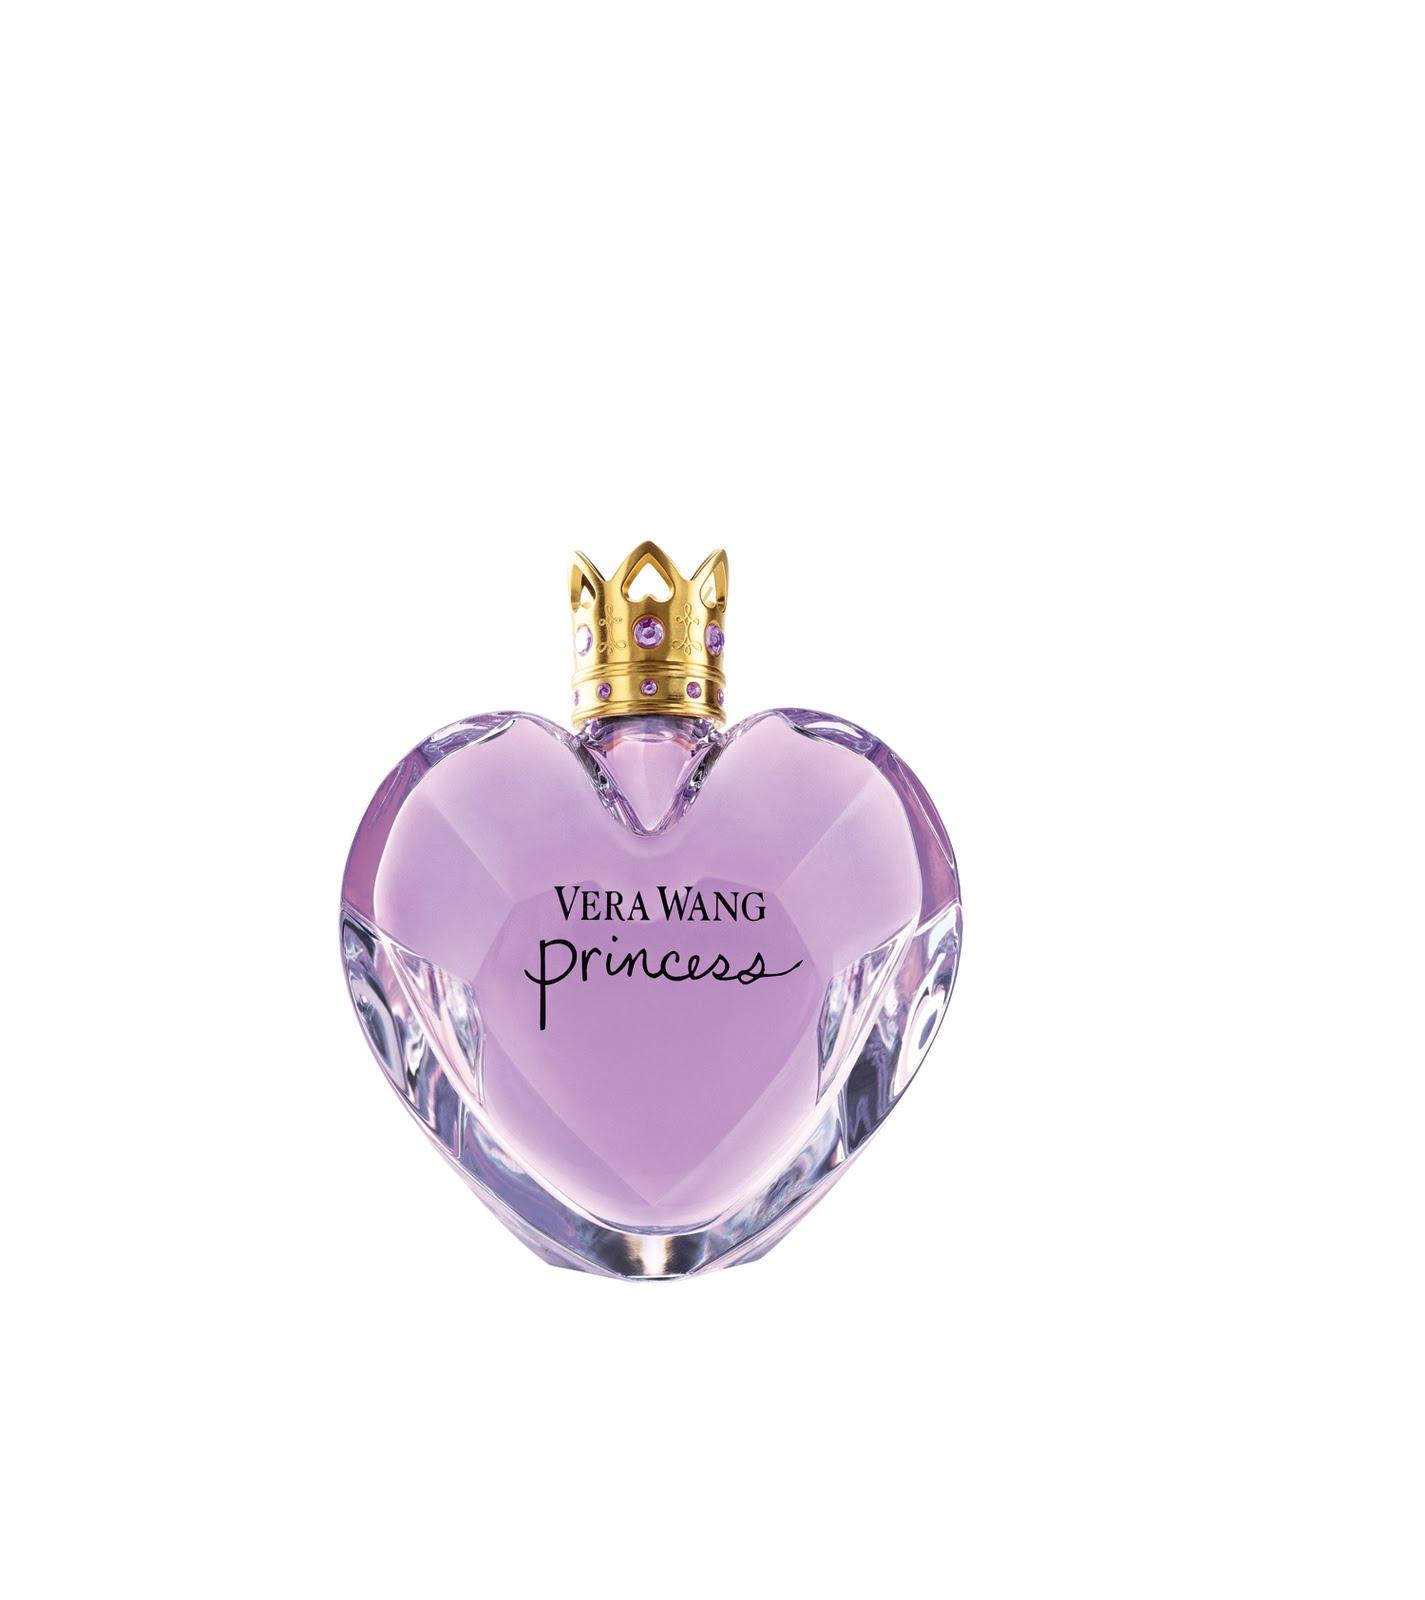 http://3.bp.blogspot.com/_s4kh02jfSZg/S6tYDMcxooI/AAAAAAAAOBs/m_uePs0ik_Y/s1600/Princess%2Bbottle%2B300dpi.jpg